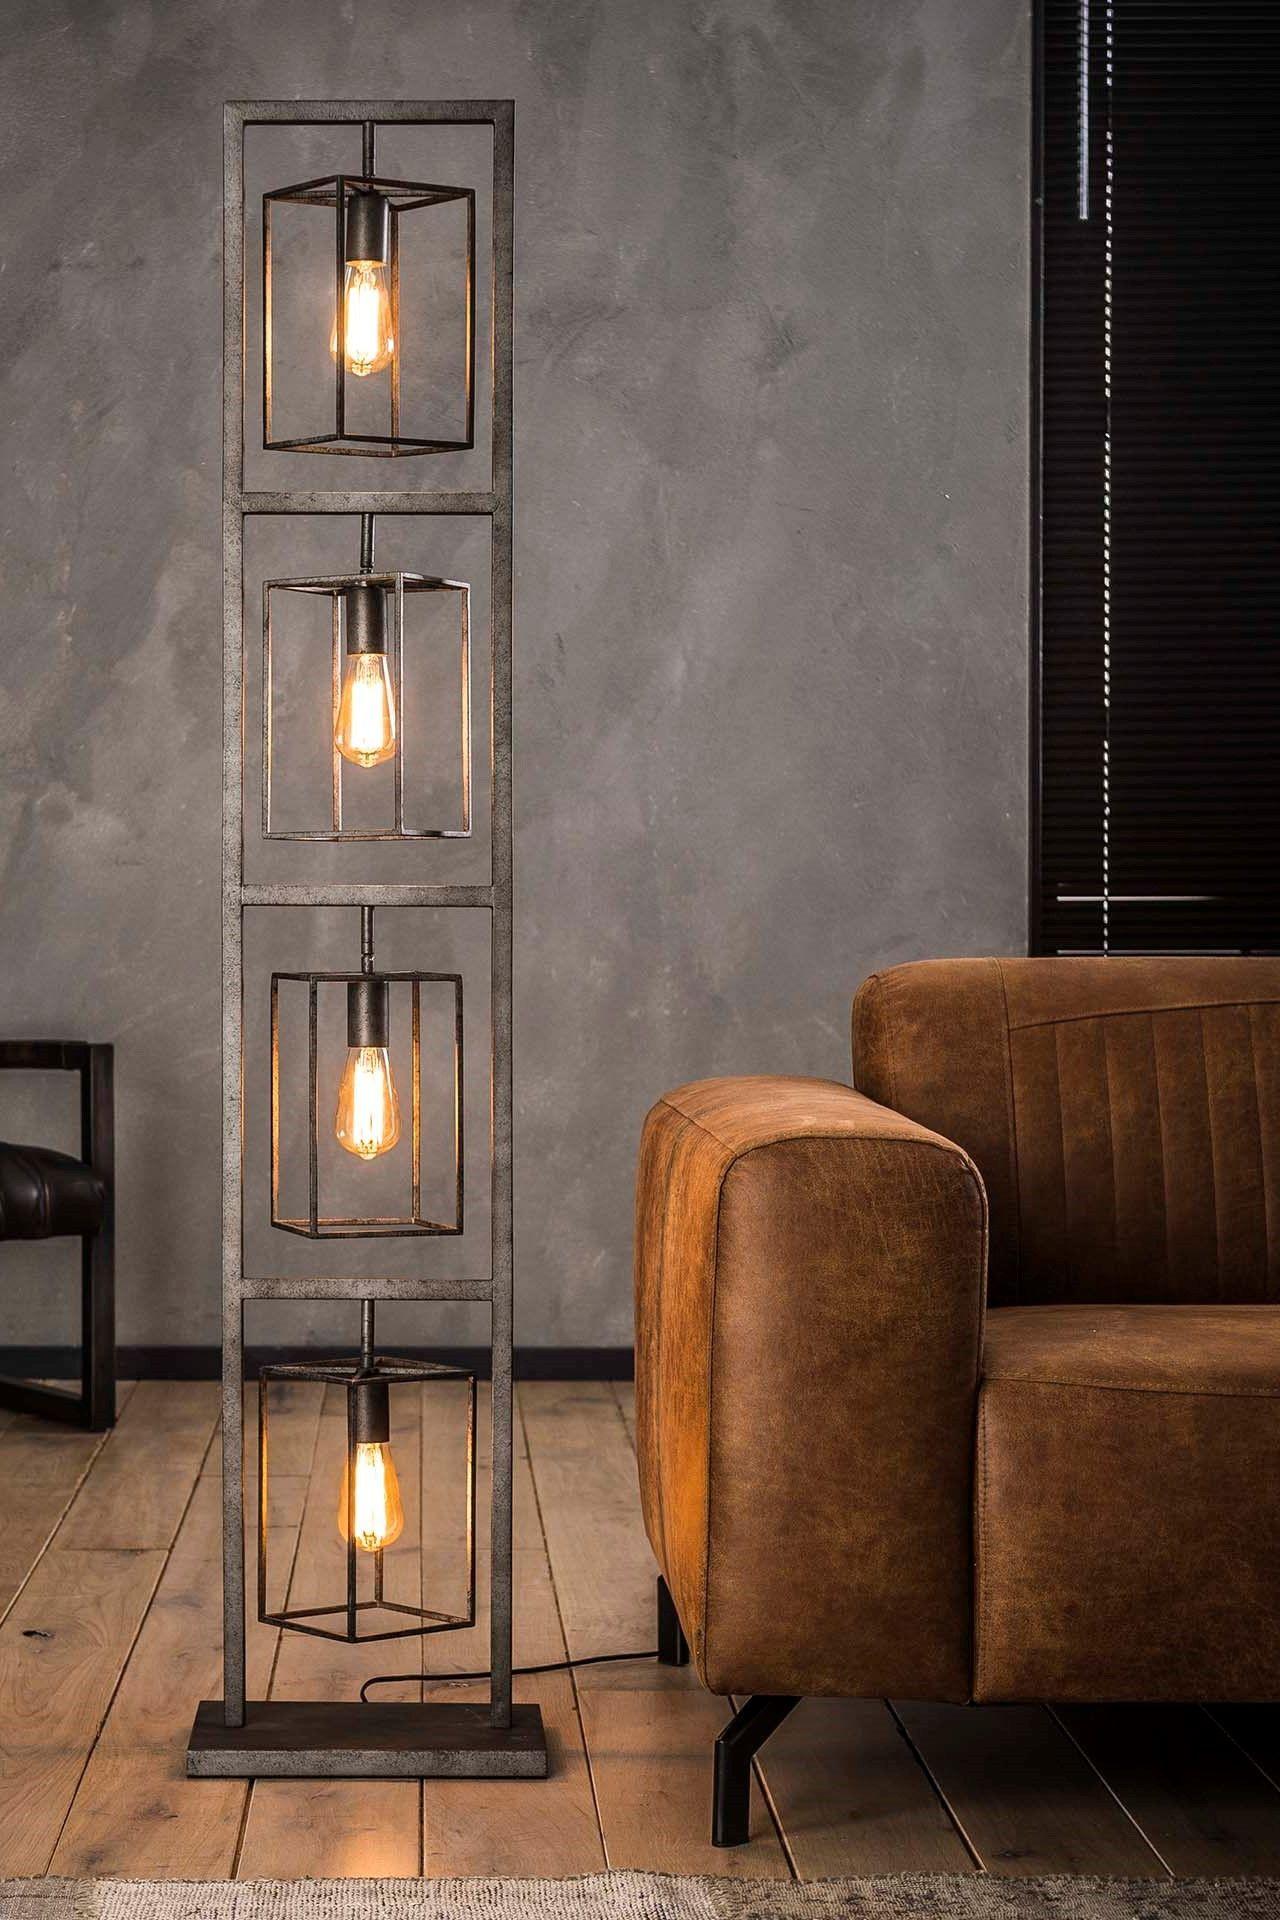 Discover more inspirational design ideas for your home decor and